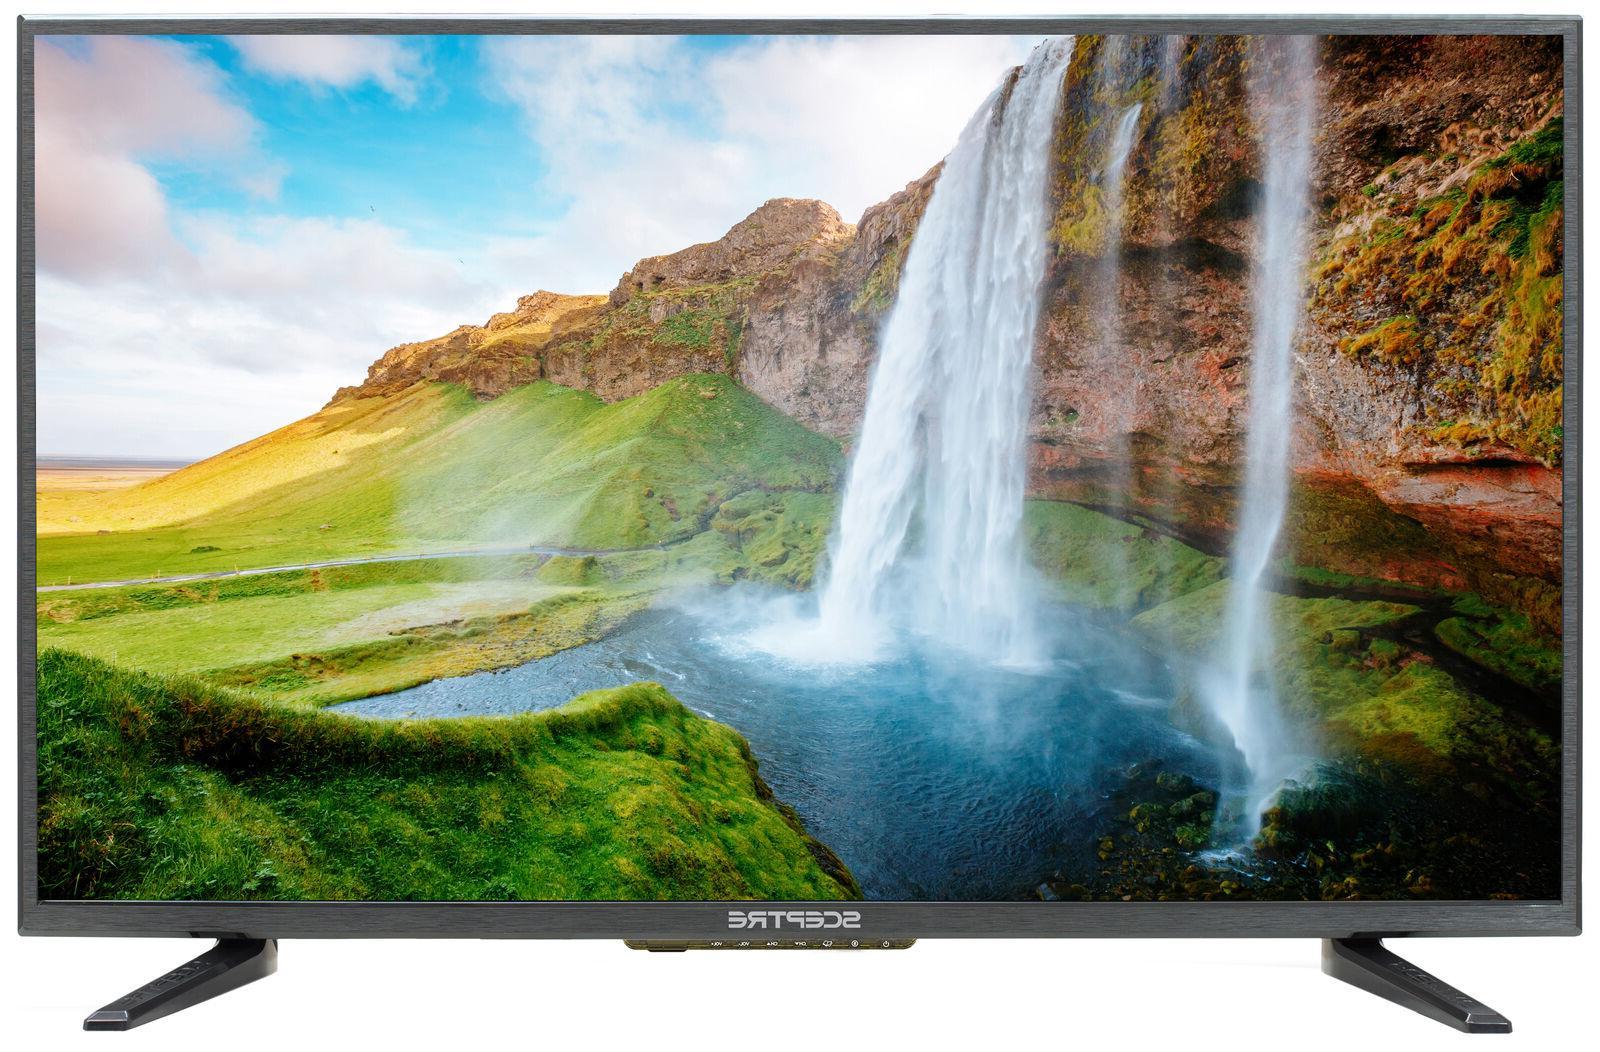 "New Sceptre 32"" Class HD 720P LED TV Flat Screen HDMI USB Ho"